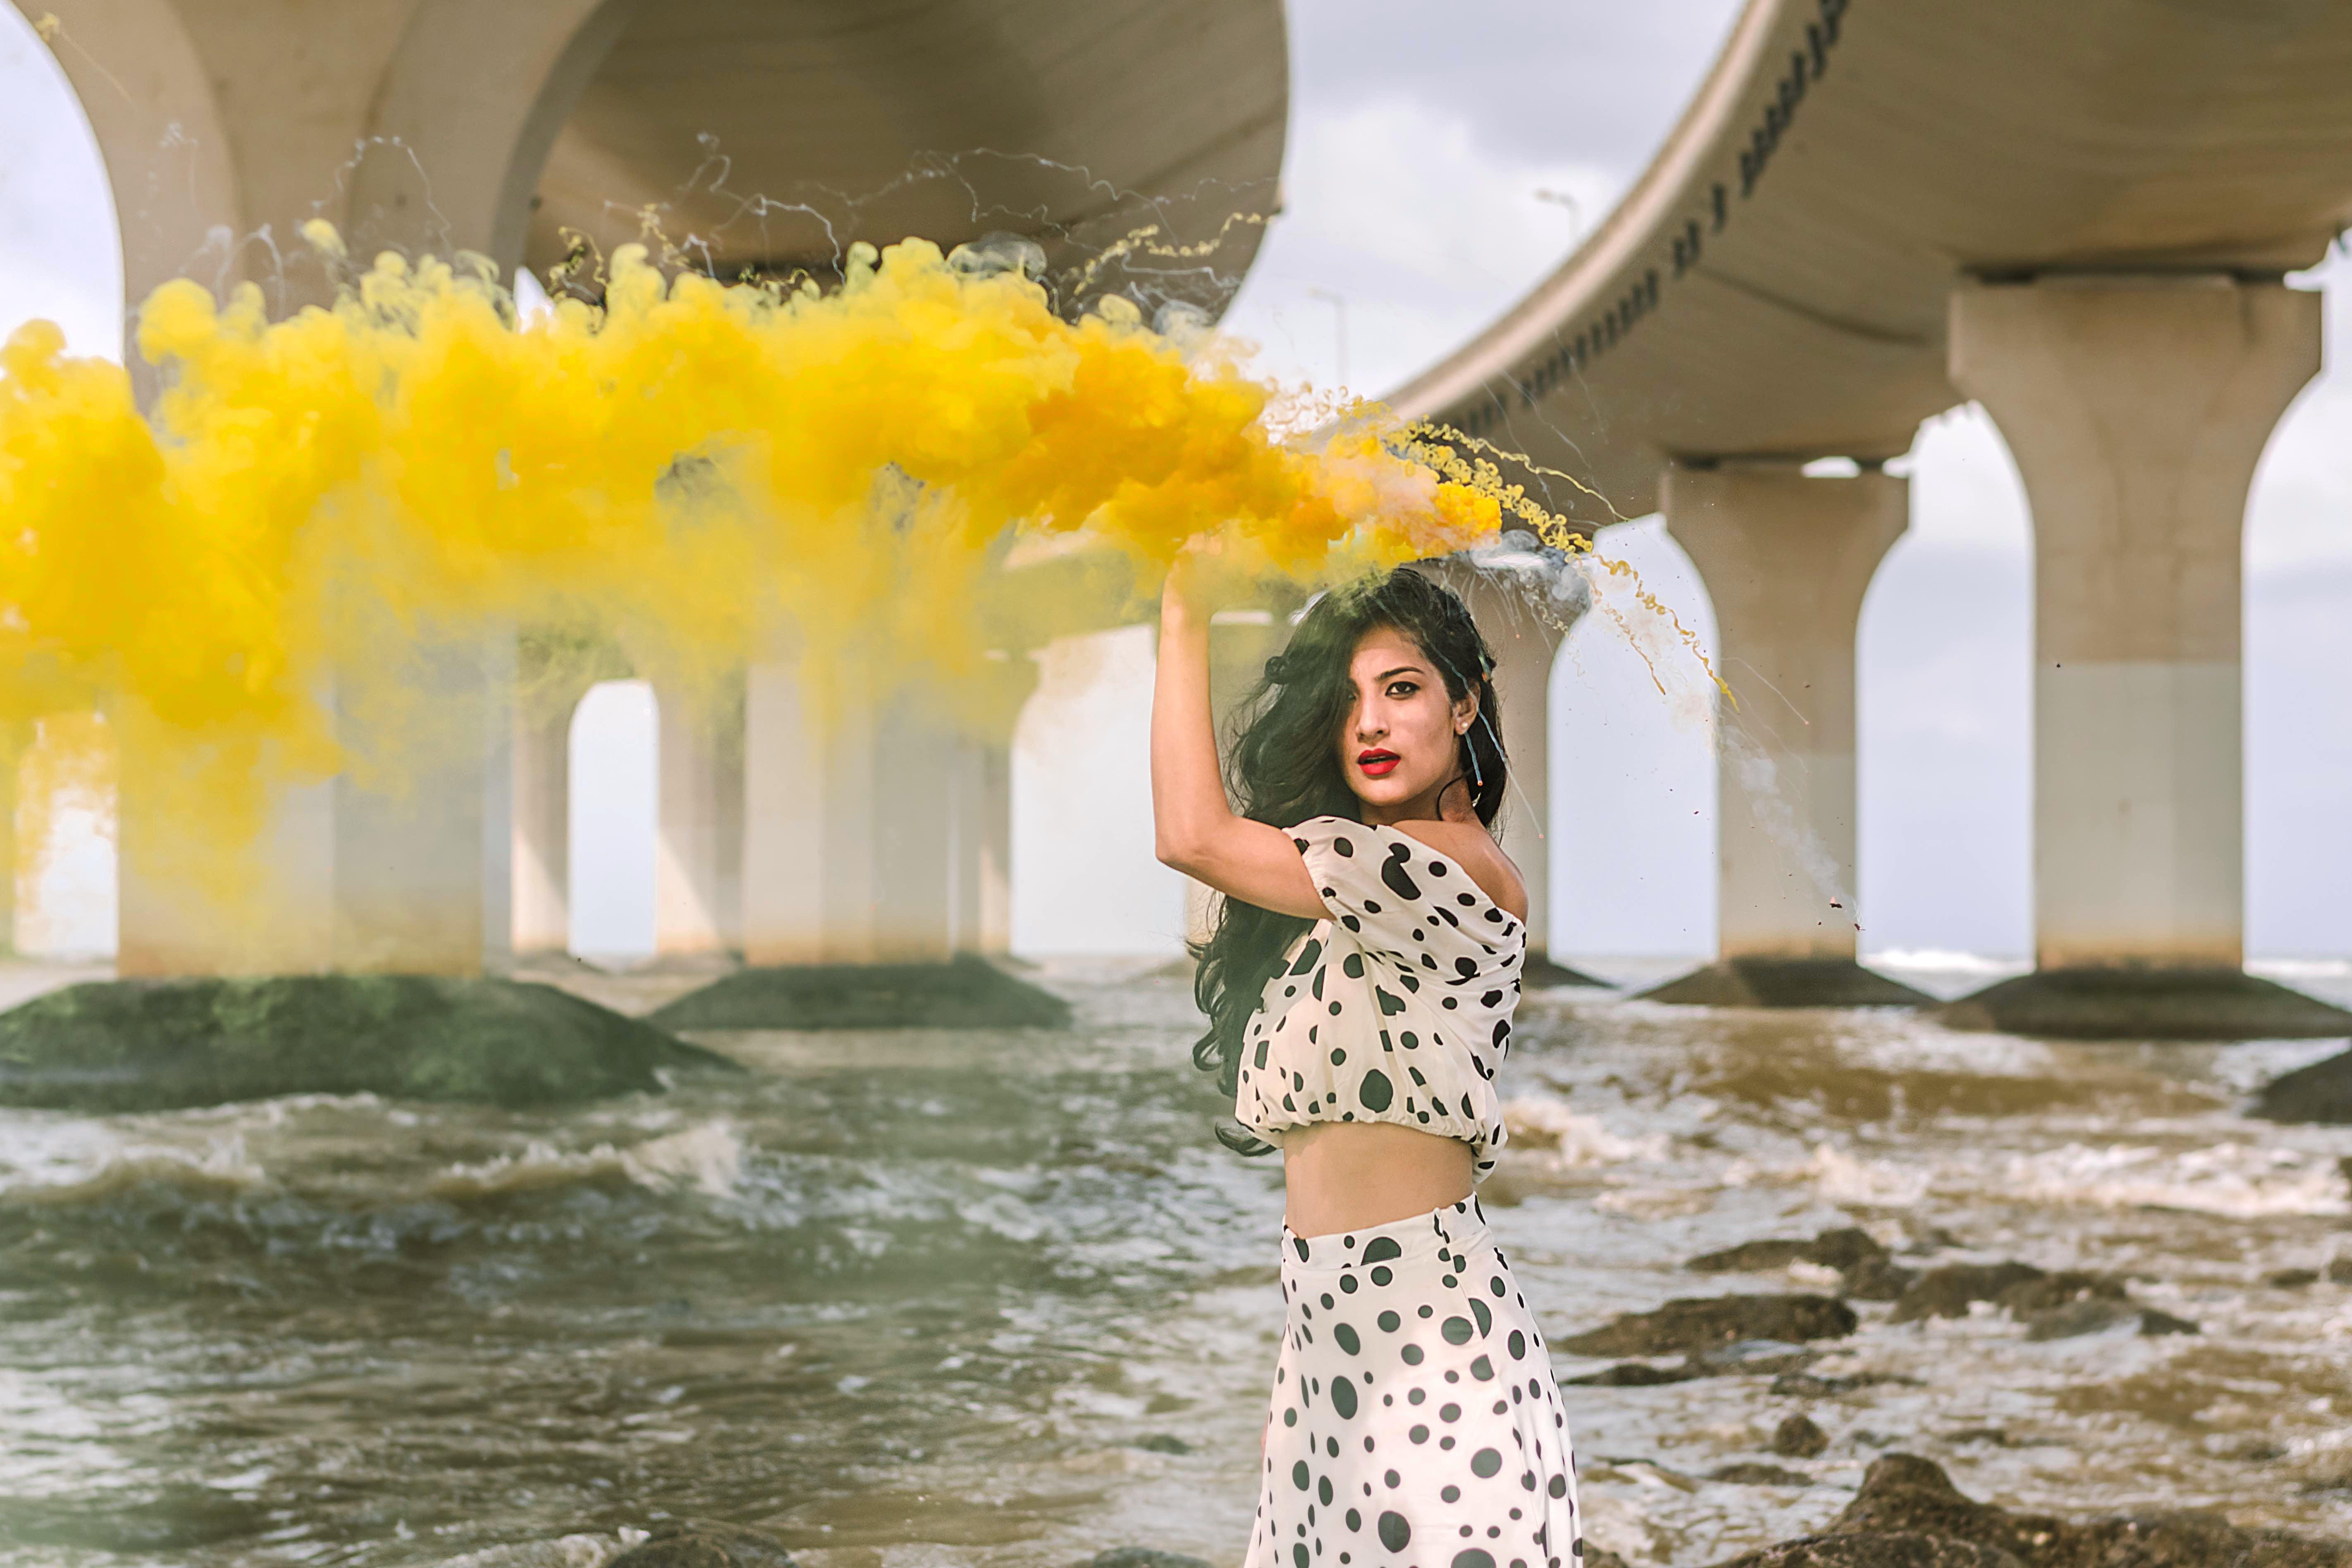 Yellow,Photograph,Lady,Beauty,Summer,Water,Fun,Fashion,Design,Spring